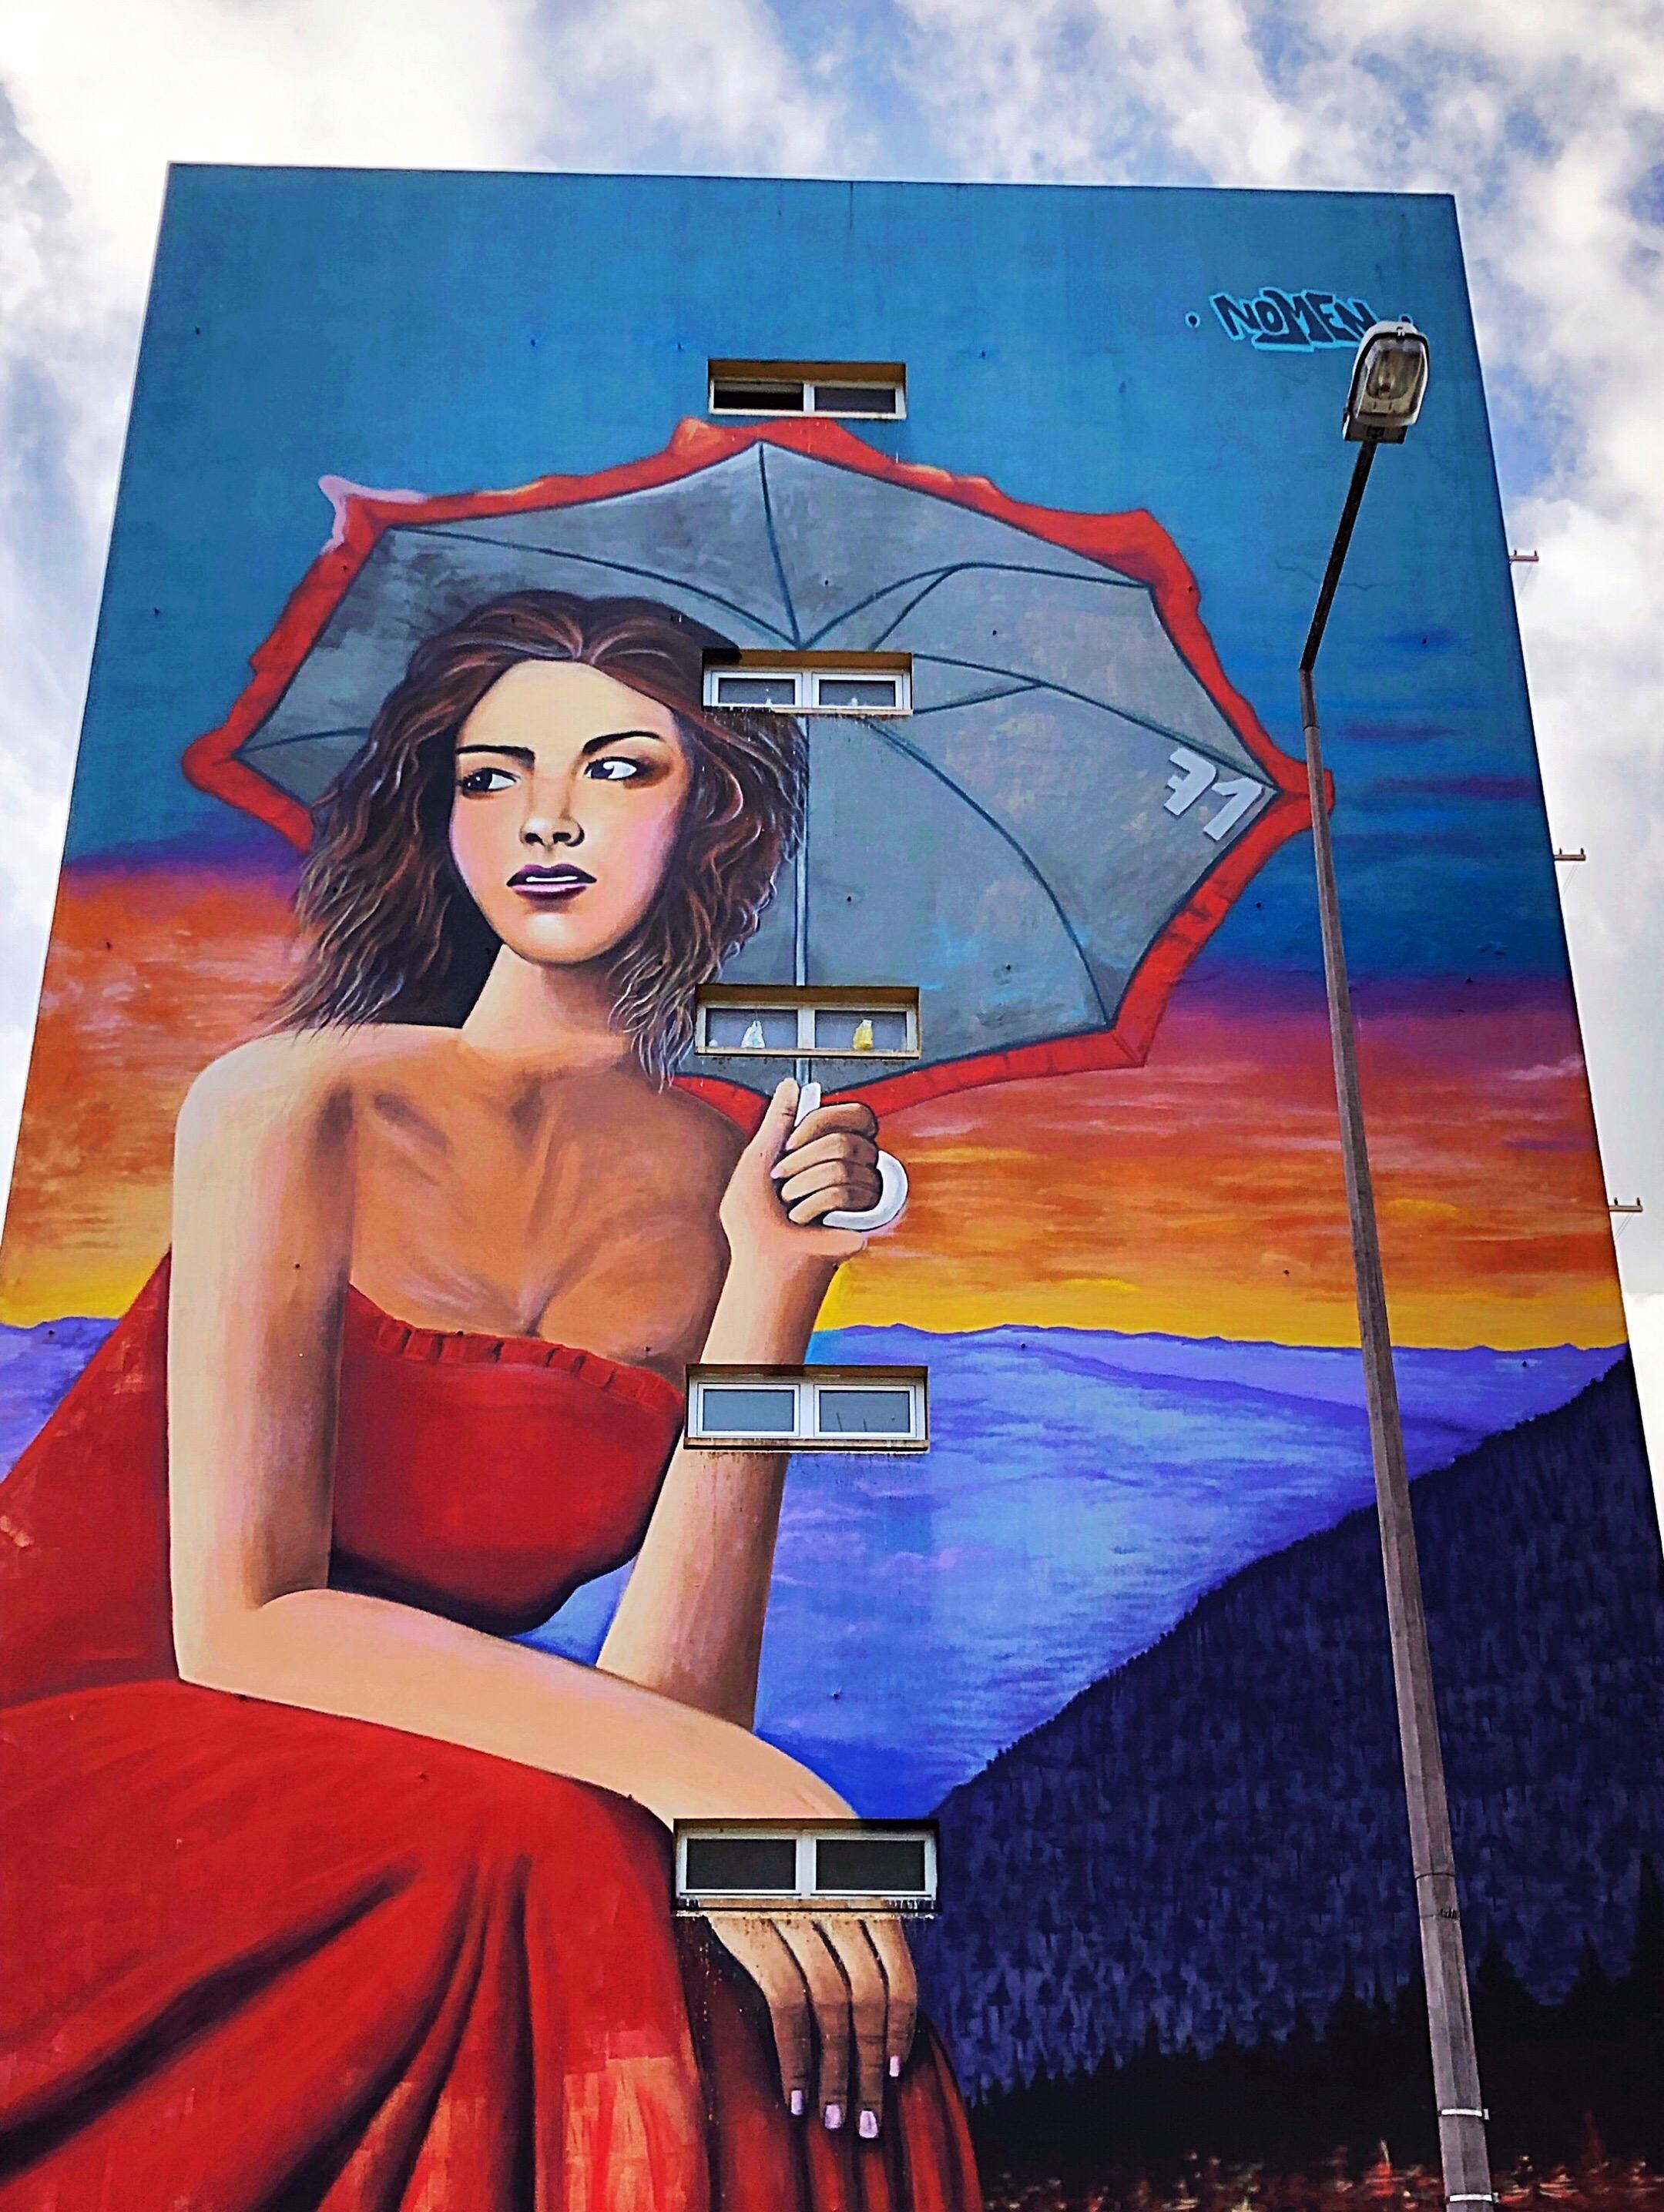 Art by Nomen